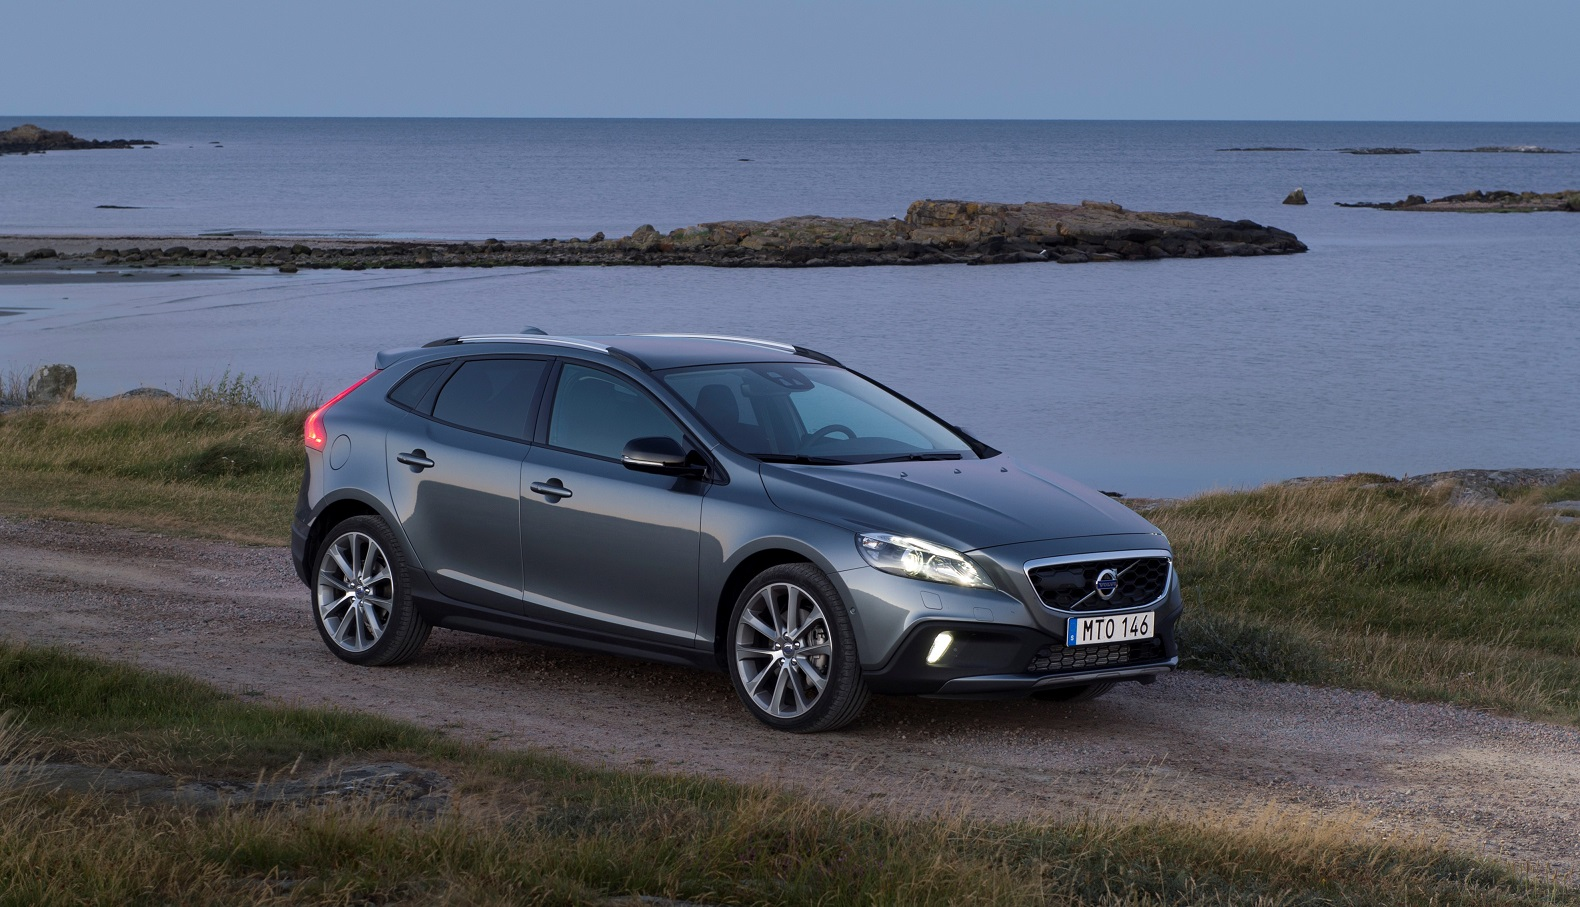 V40%2BCROSS%2BCOUNTRY%2B1.5%2BT3%2BAUTO 3 Το Volvo V40 Cross Country με το νέο κινητήρα 1,5 λίτρων, απόδοσης 152 ίππων από 21.900 €